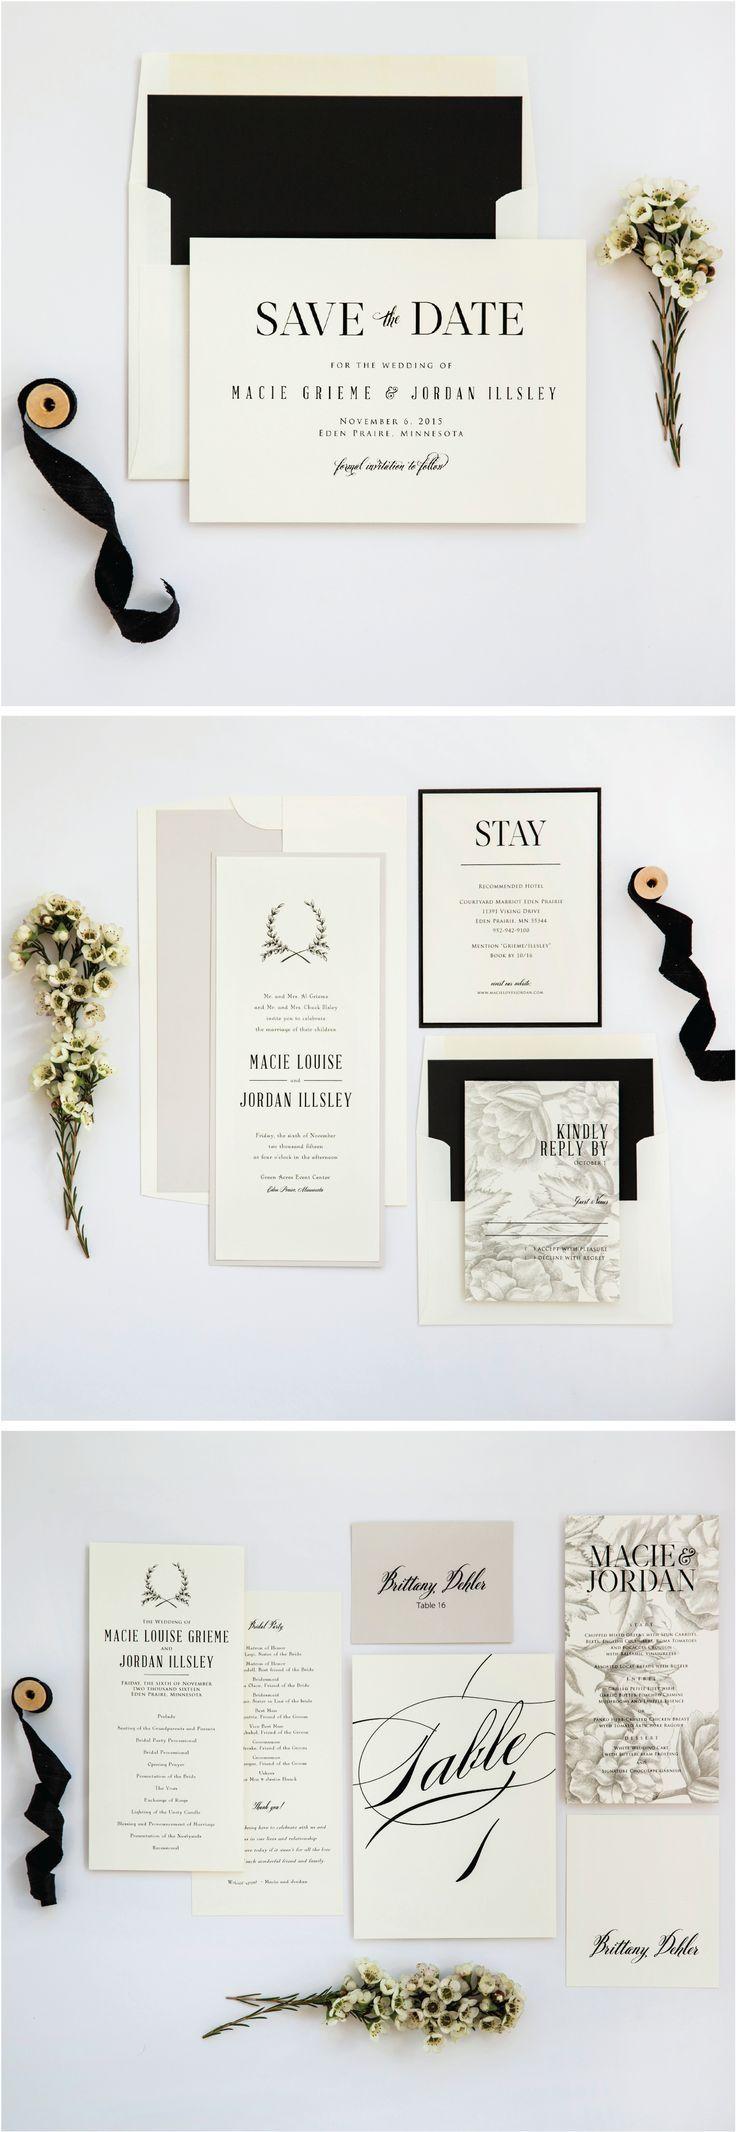 Ivory, Stone & Black Neutral Rustic Wedding Invitation Suite